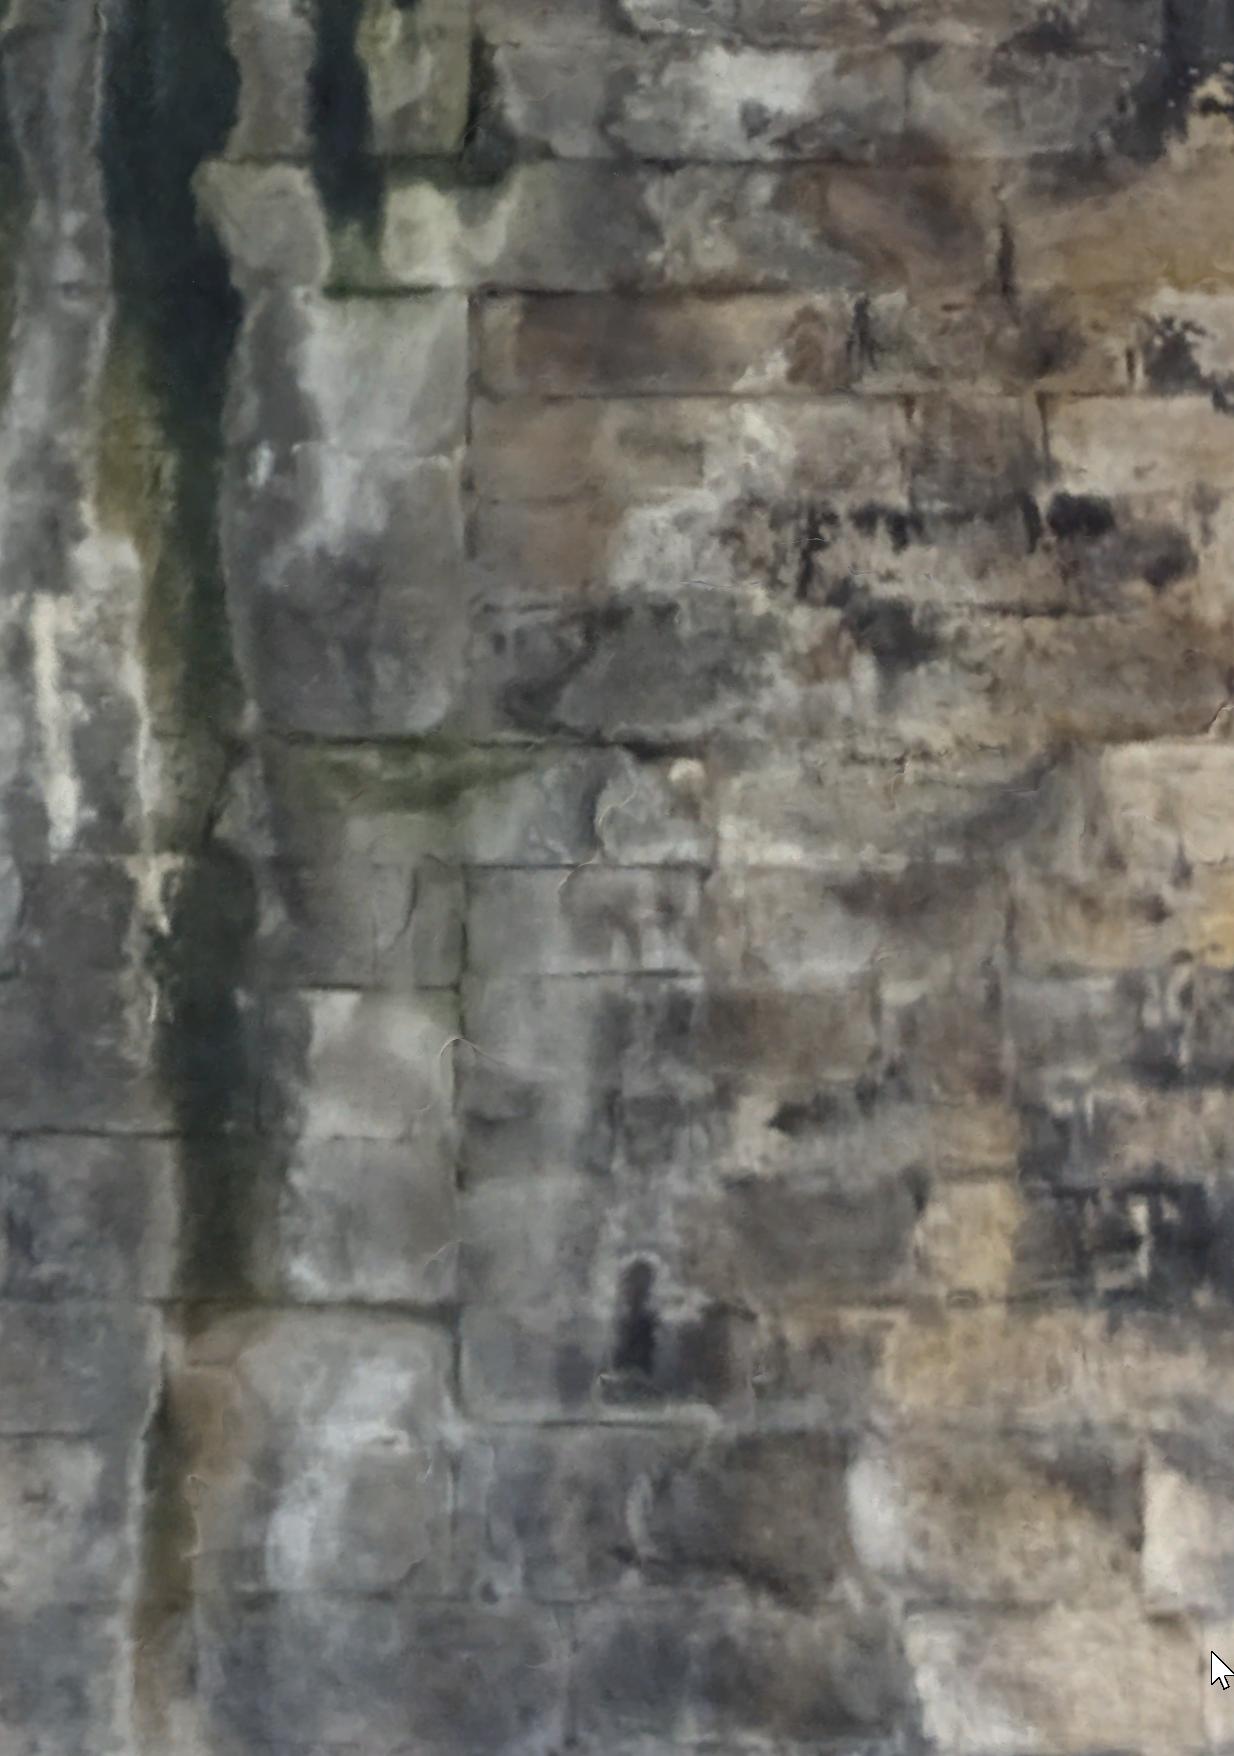 bom-91-south-bridge-edinburgh-21.png